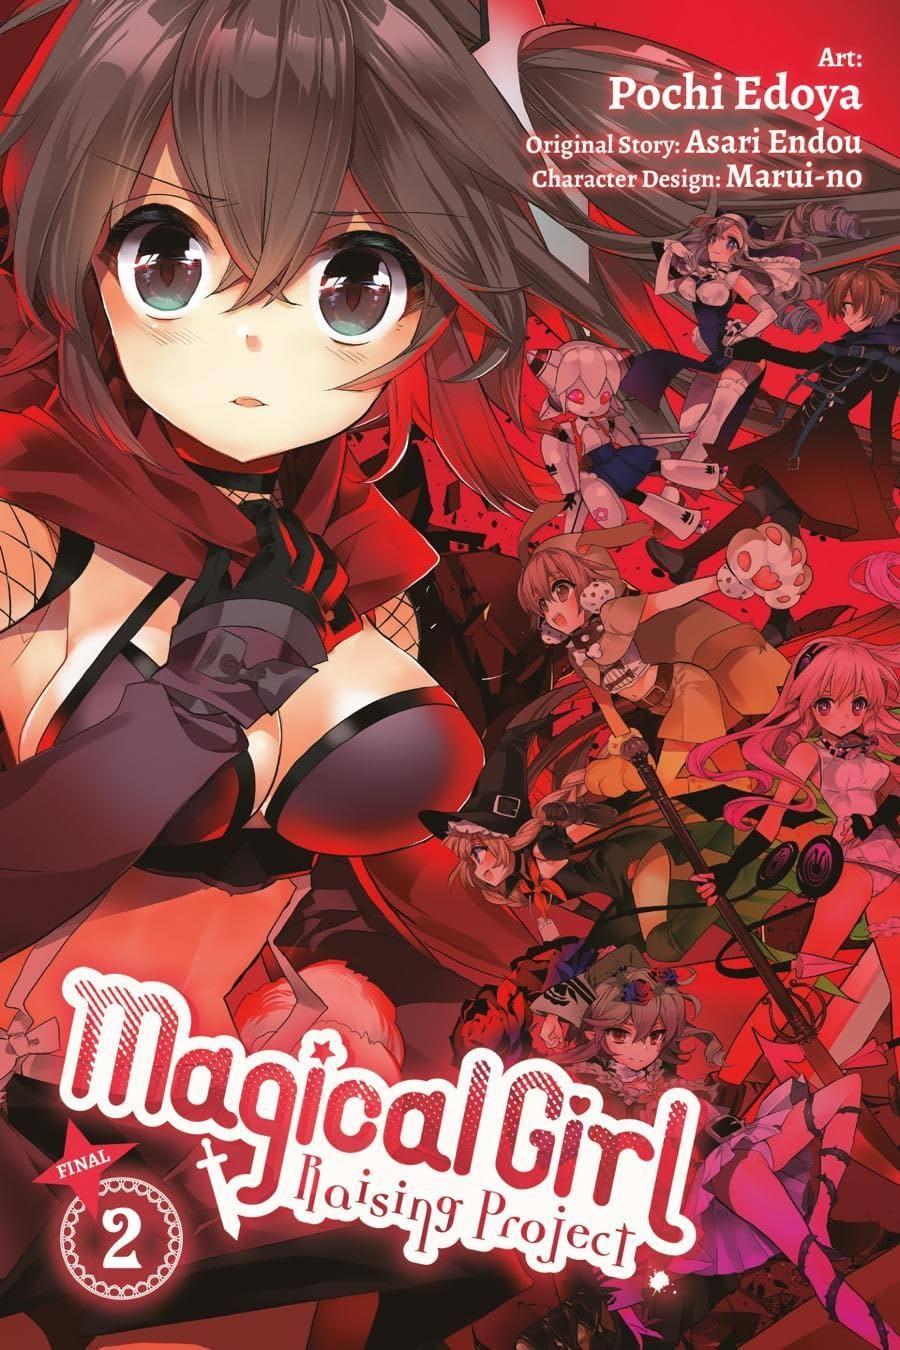 Magical Girl Raising Project Vol. 2